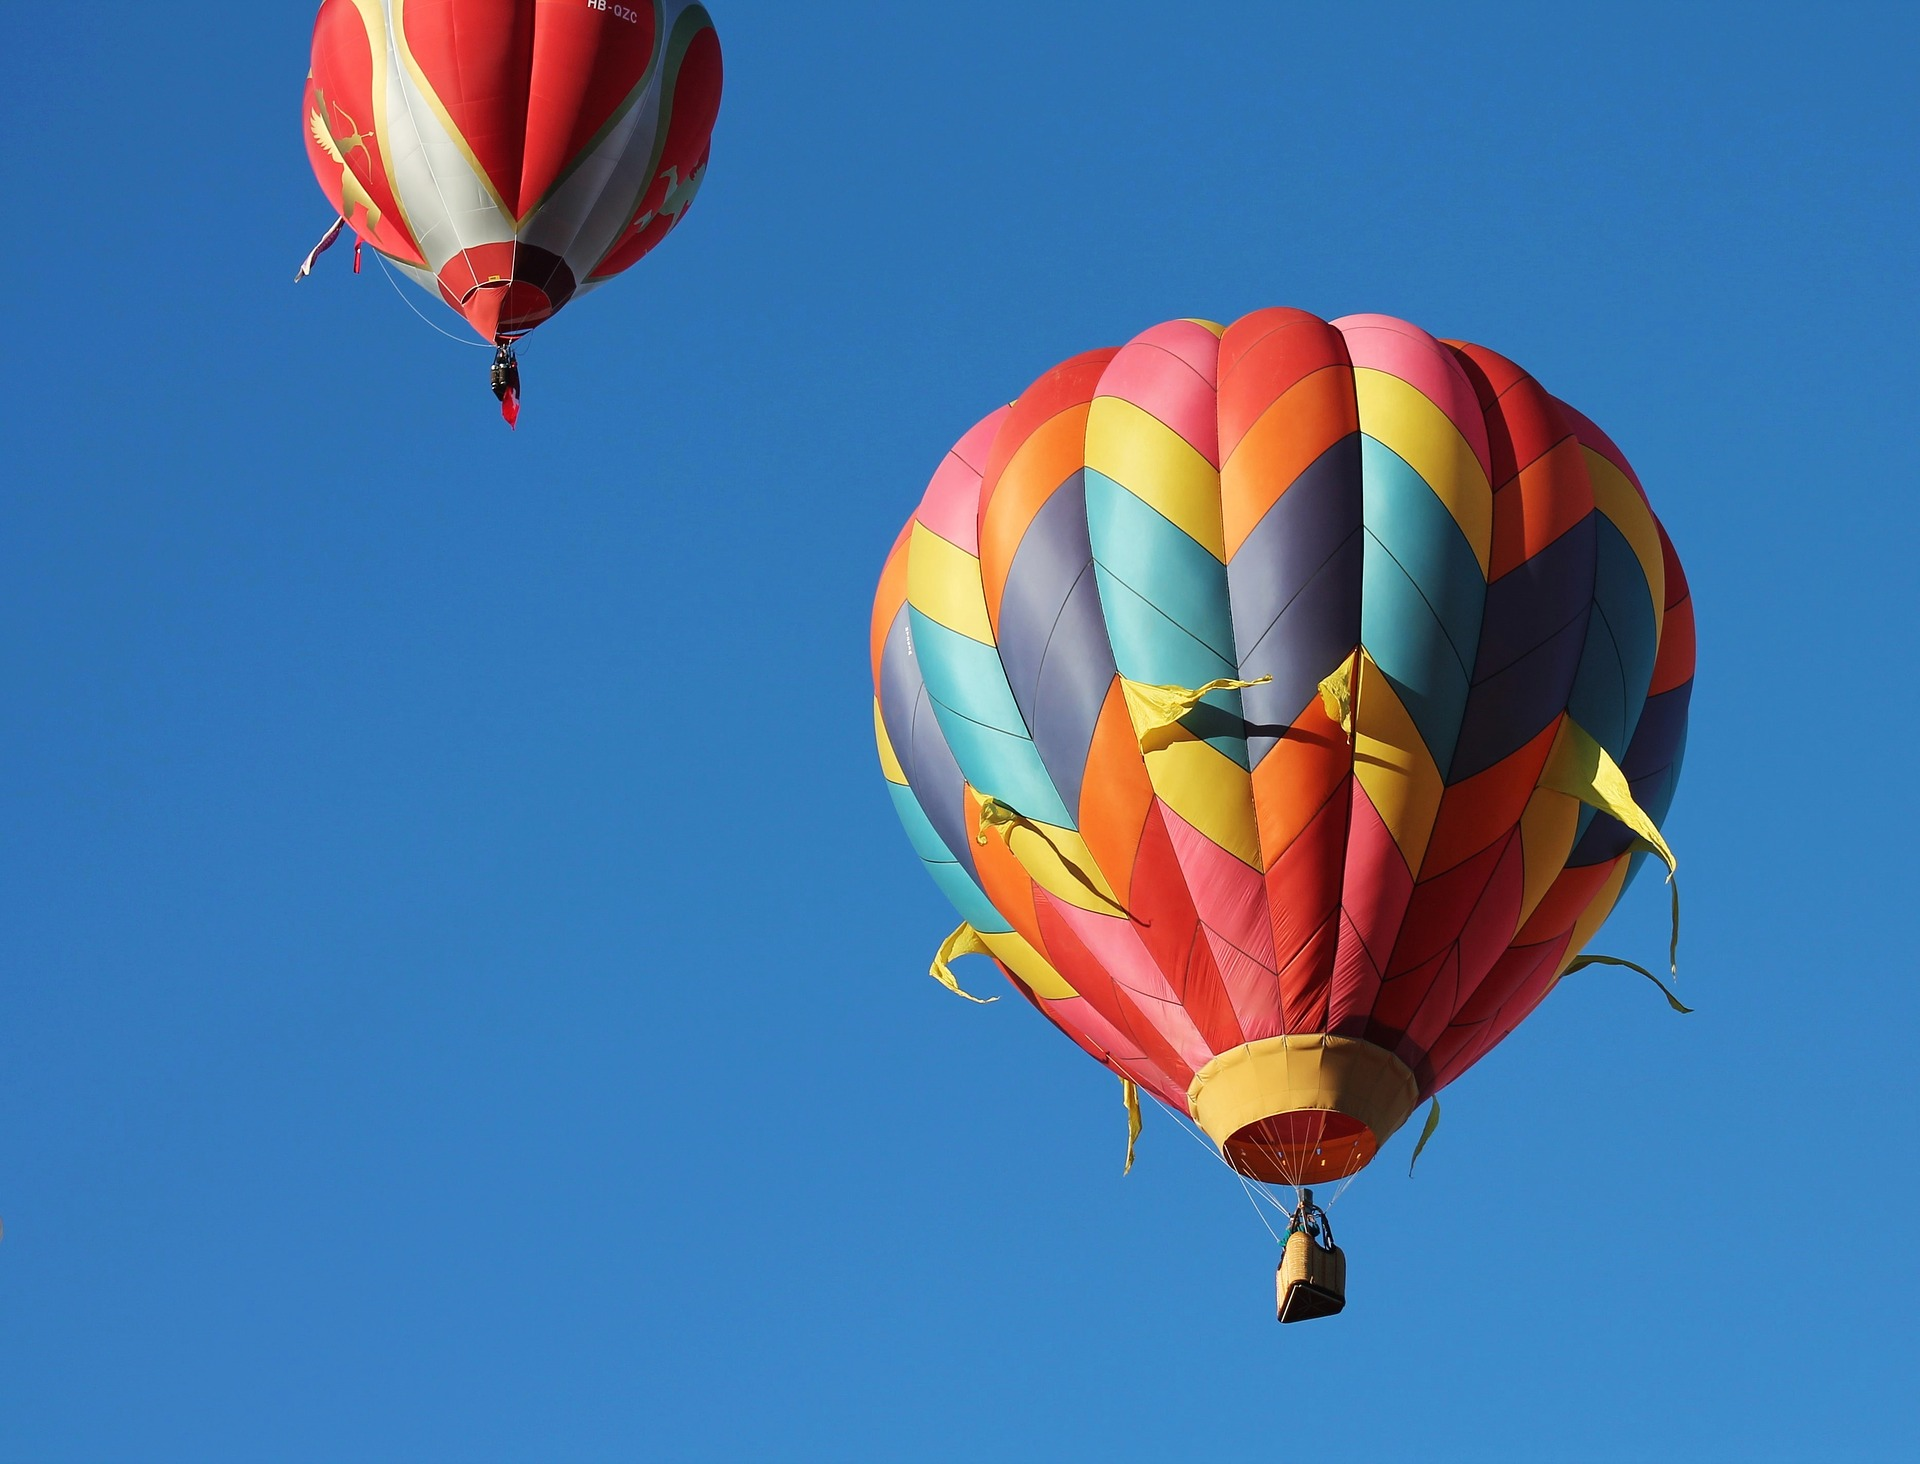 Hot air balloons, Albuquerque, NM I Outdoorsy RV Rental Marketplace